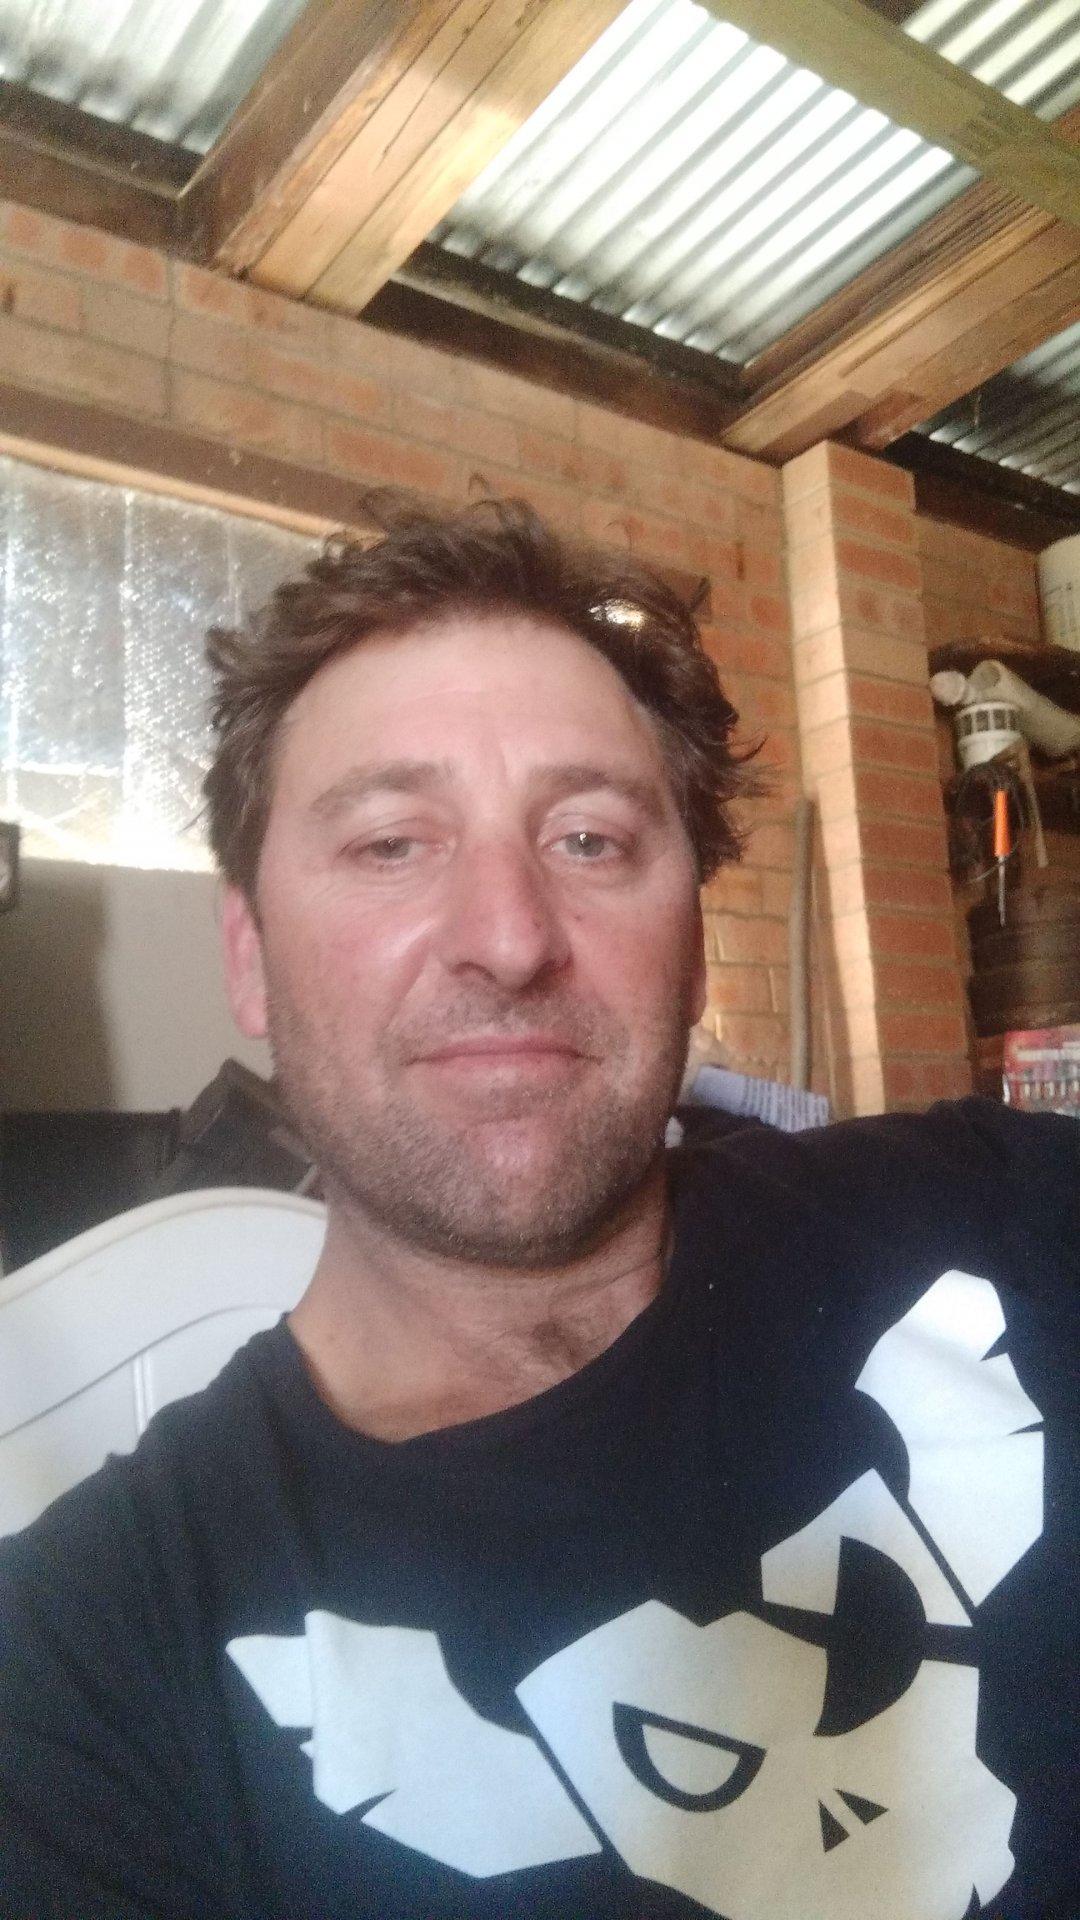 Bakes228 from Western Australia,Australia